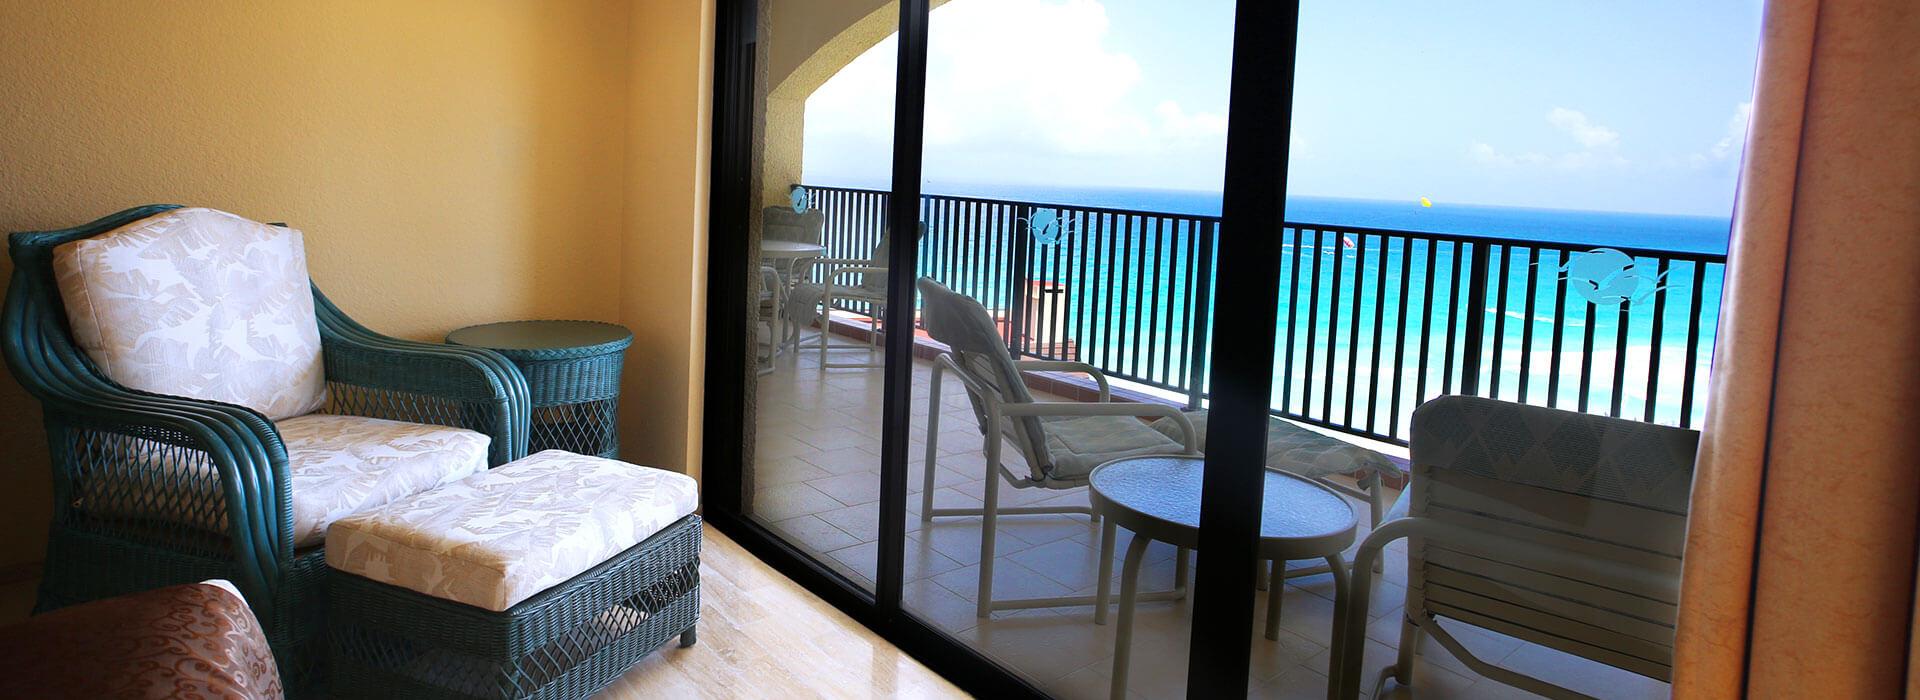 suite con terraza en cancun